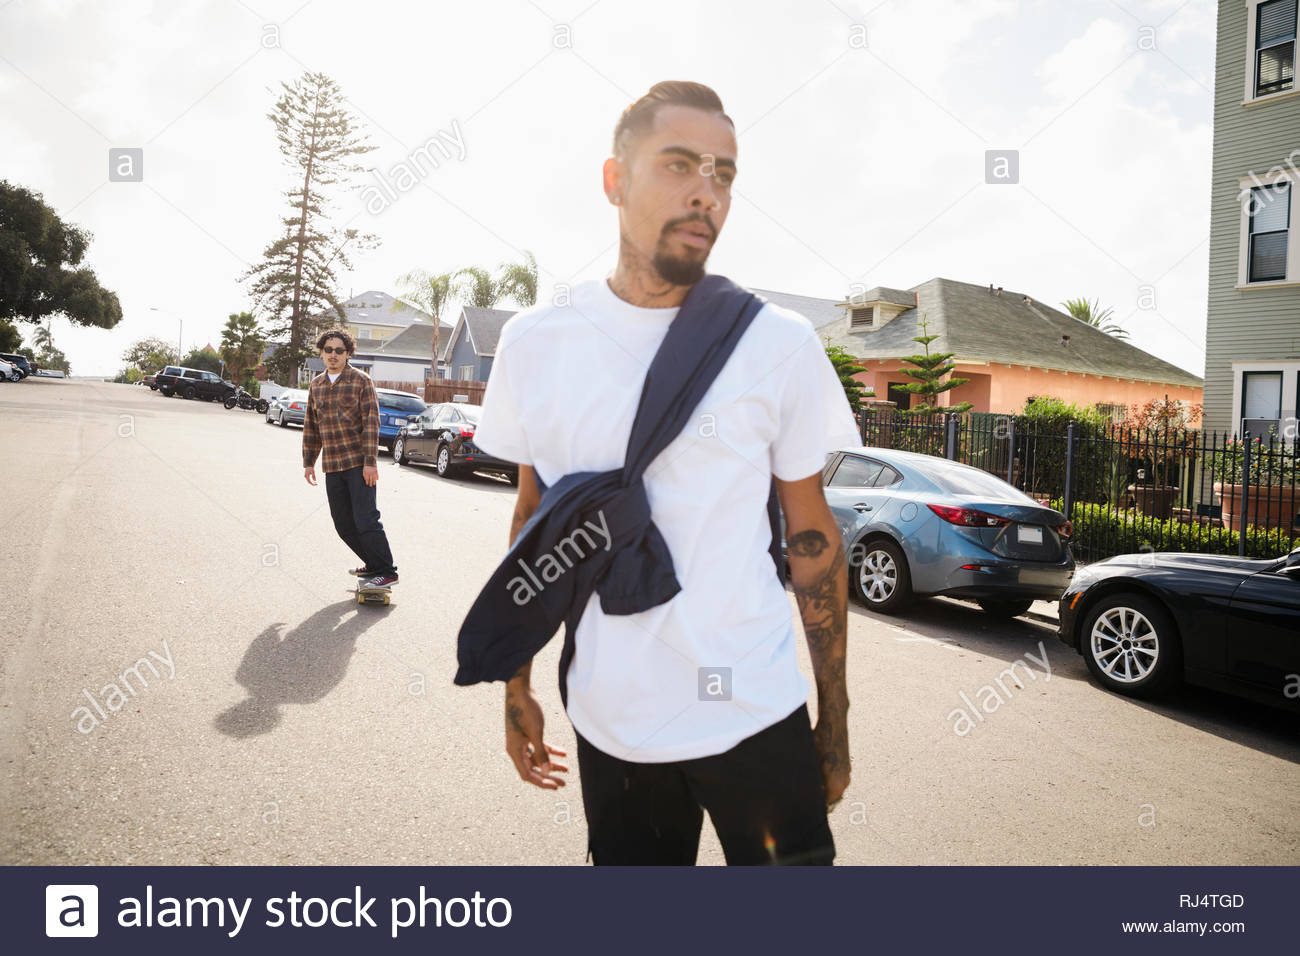 Latinx young men skateboarding on sunny street Stock Photo